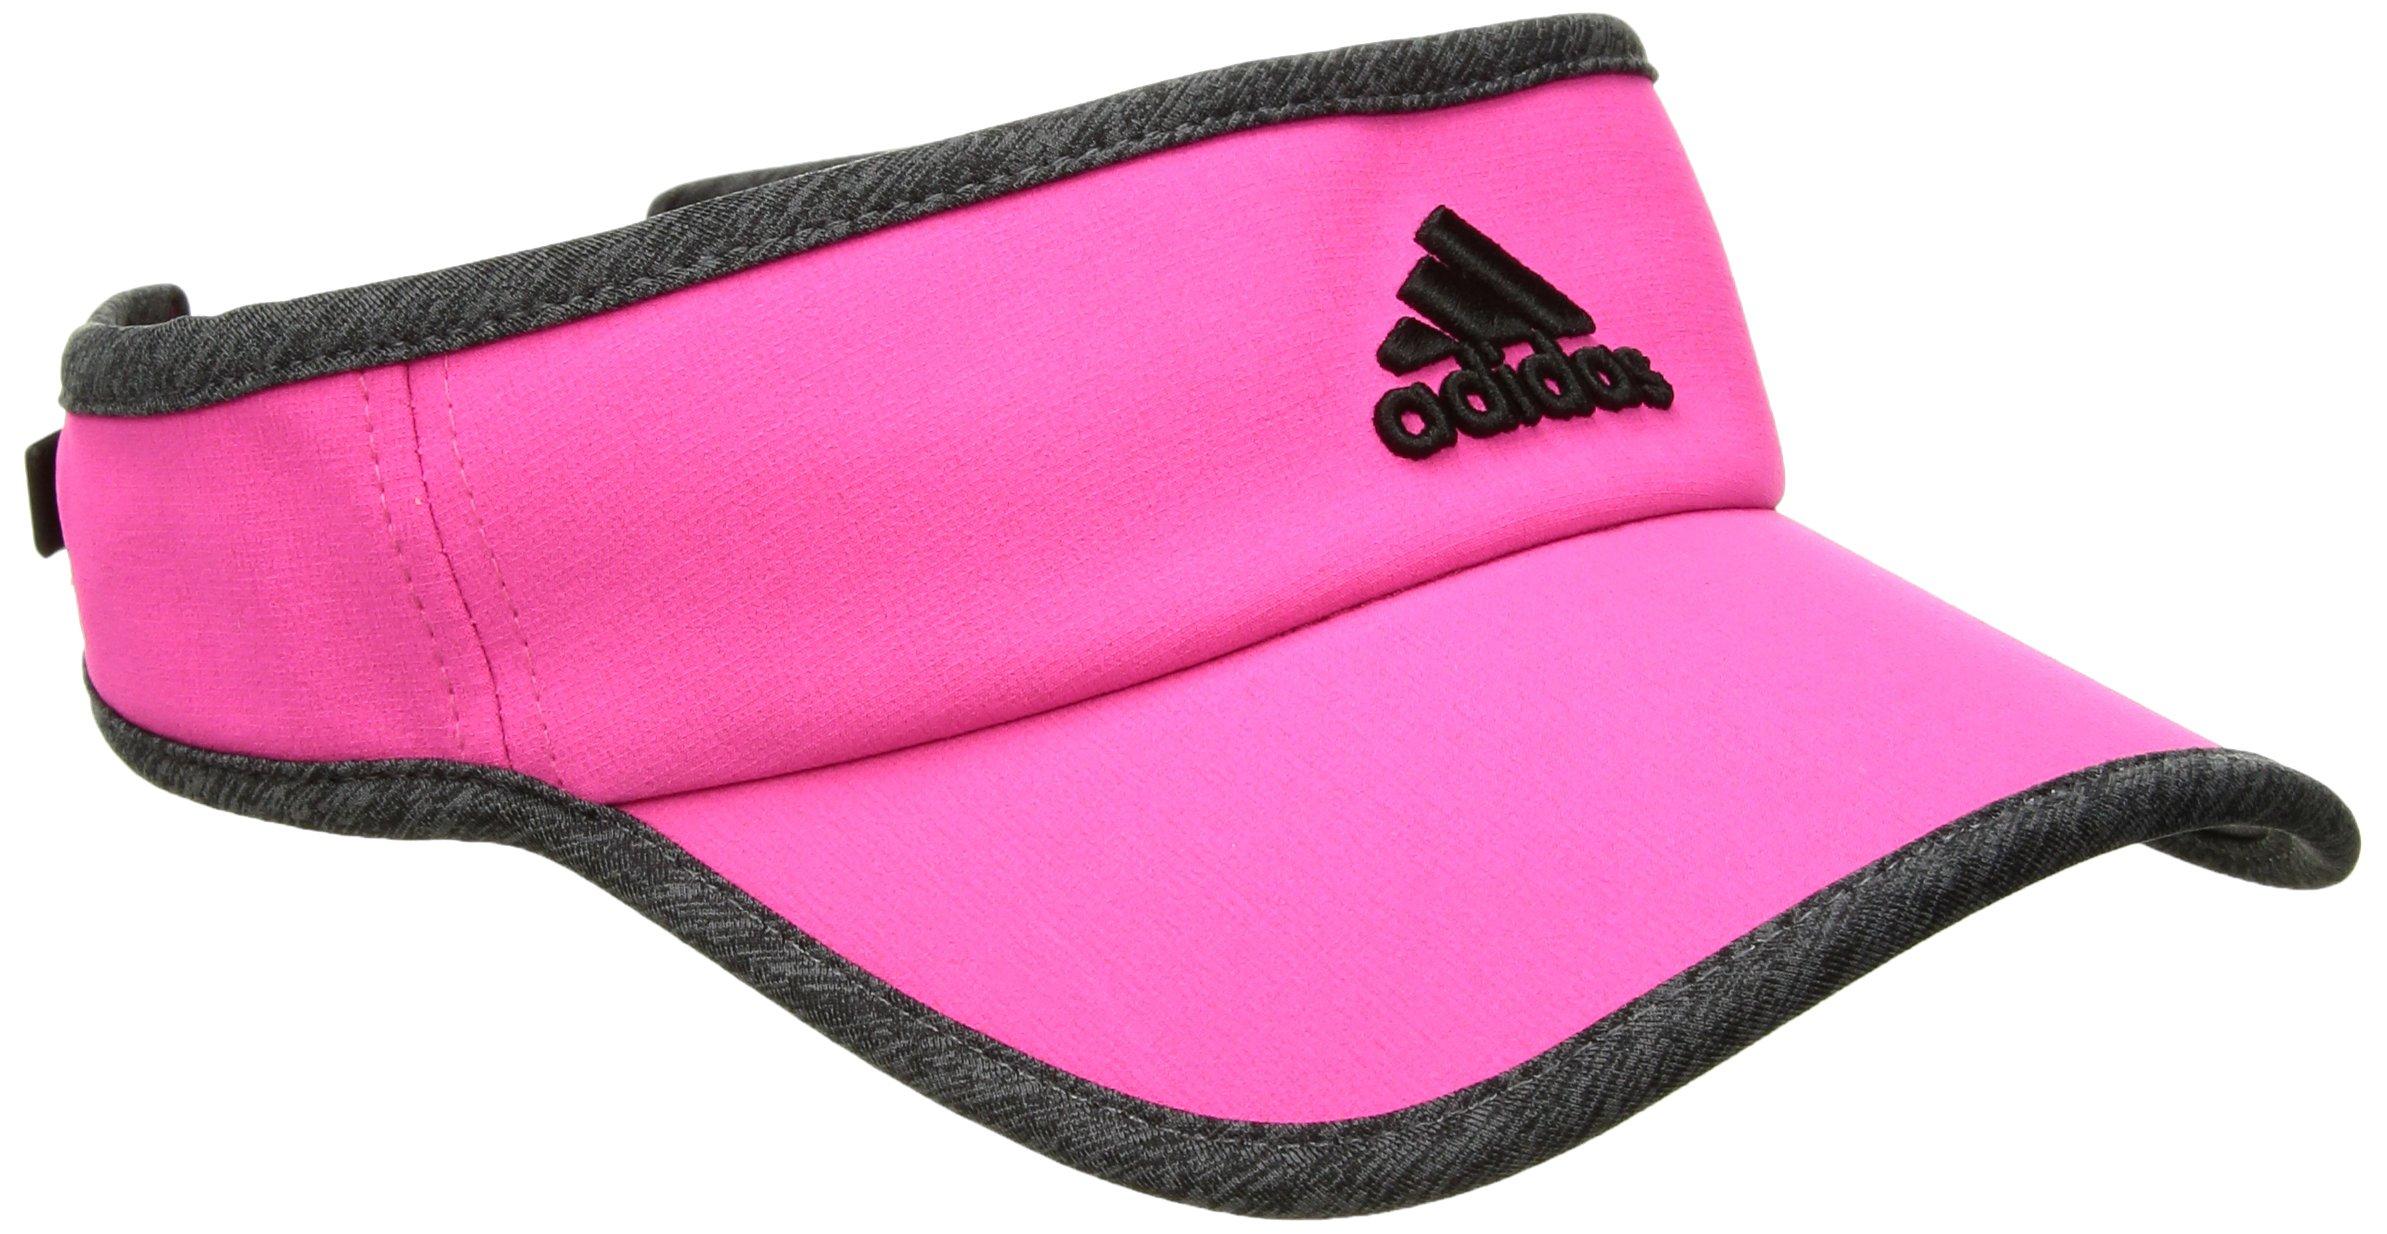 adidas Women's Adizero Ii Visor, Shock Pink/Dark Grey Heather/Black, One Size